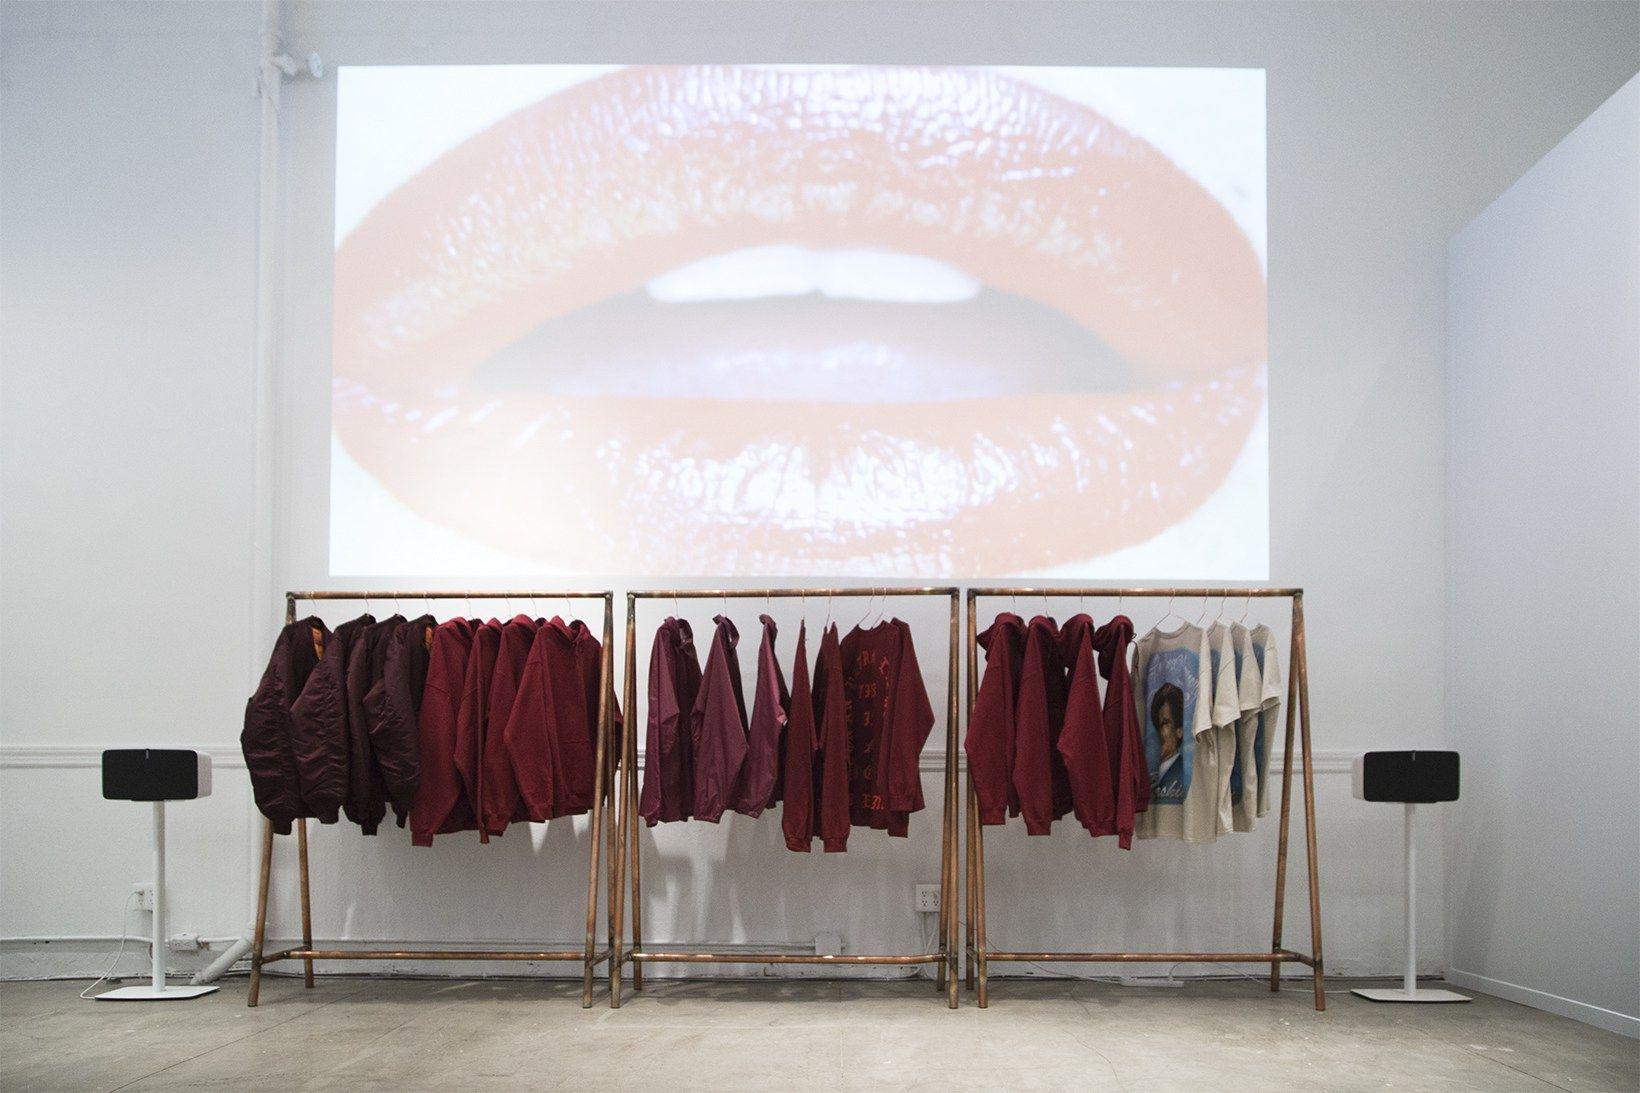 Kanye West Devotees Invade Soho Nyc For The Life Of Pablo Pop Up Shop Retail Space Design Pop Up Pop Up Shop